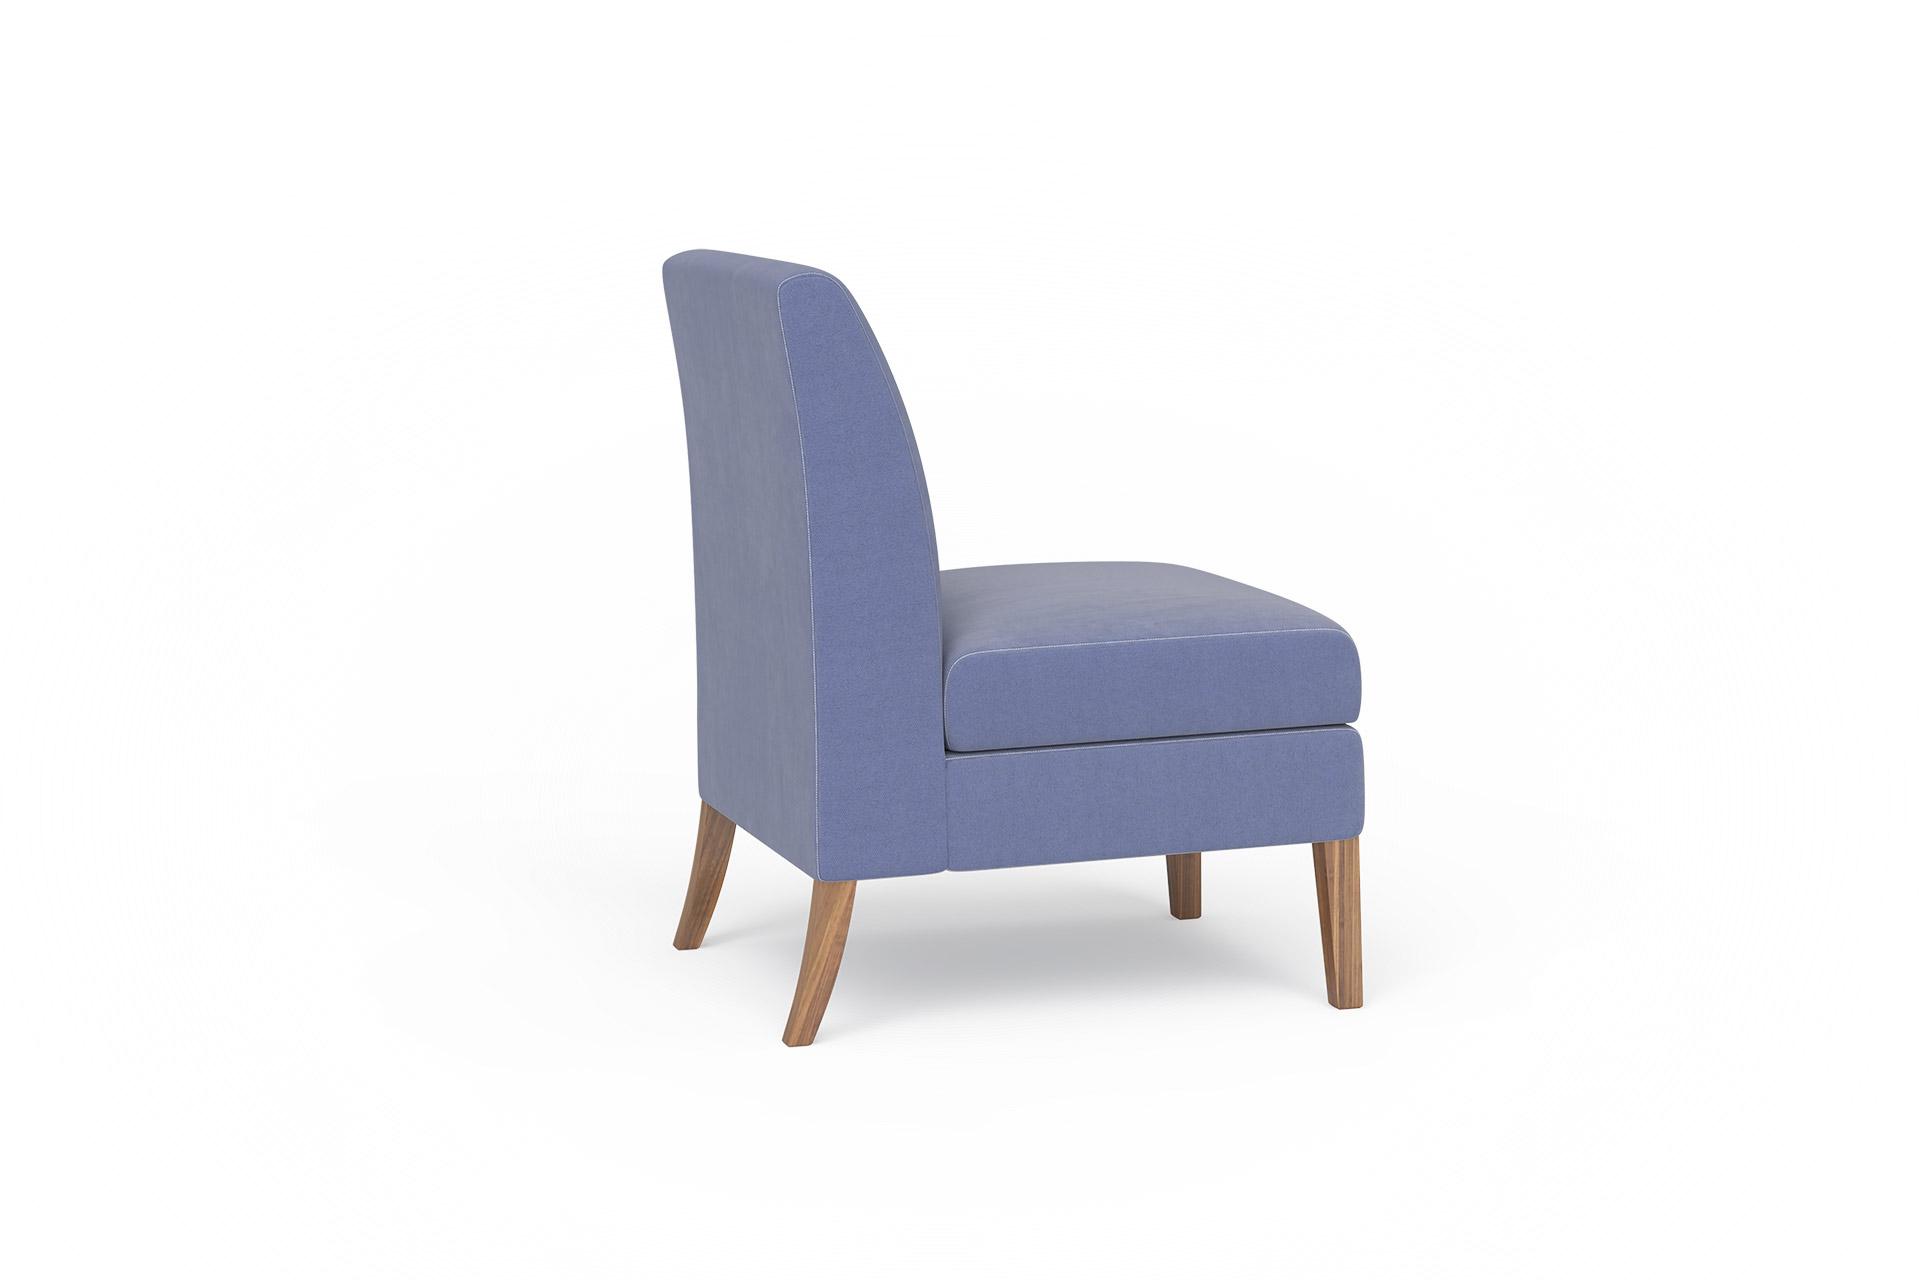 loft-and-manor-manhattan-chair-1